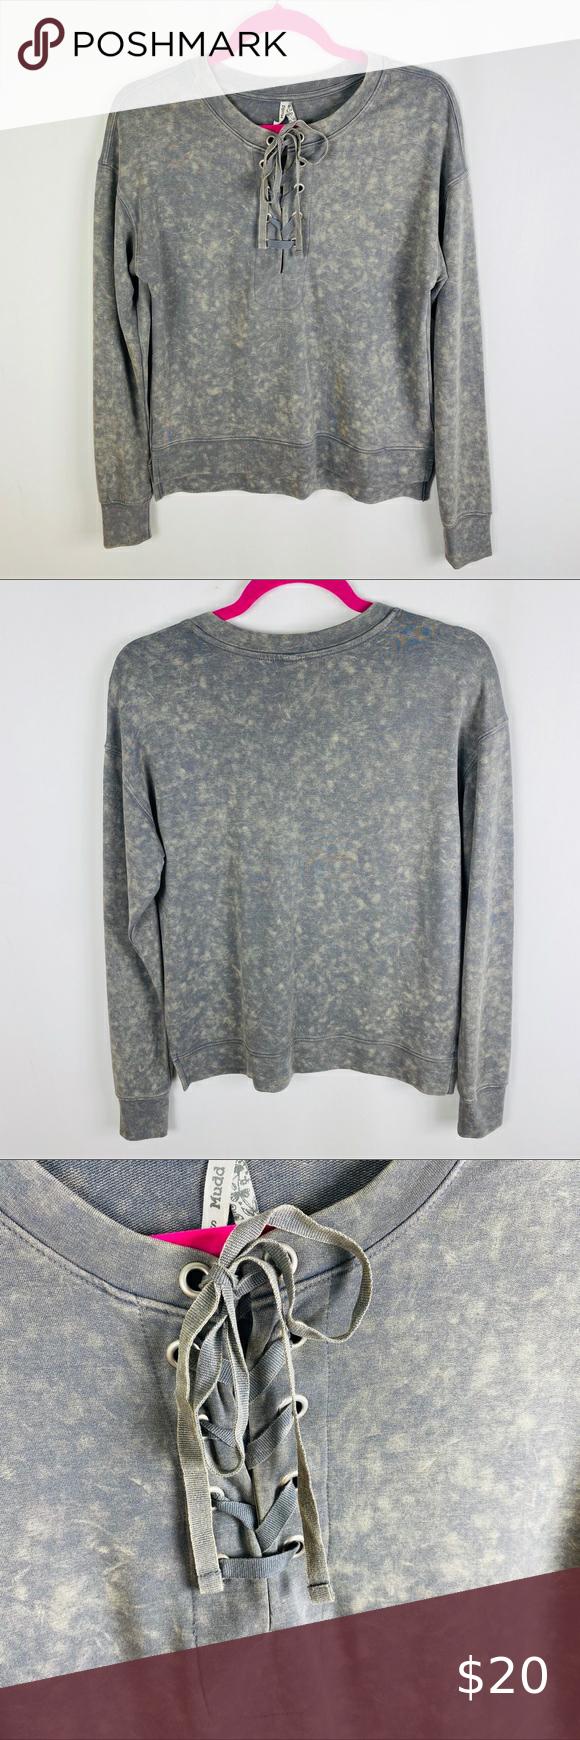 Mudd Gray Tan Tie Dye Lace Up Sweatshirt Mudd Gray Tan Lace Up Front Tie Dye Sweatshirt Soft Light Weight M Tie Dye Sweatshirt Grey Sweatshirt Sweatshirts [ 1740 x 580 Pixel ]